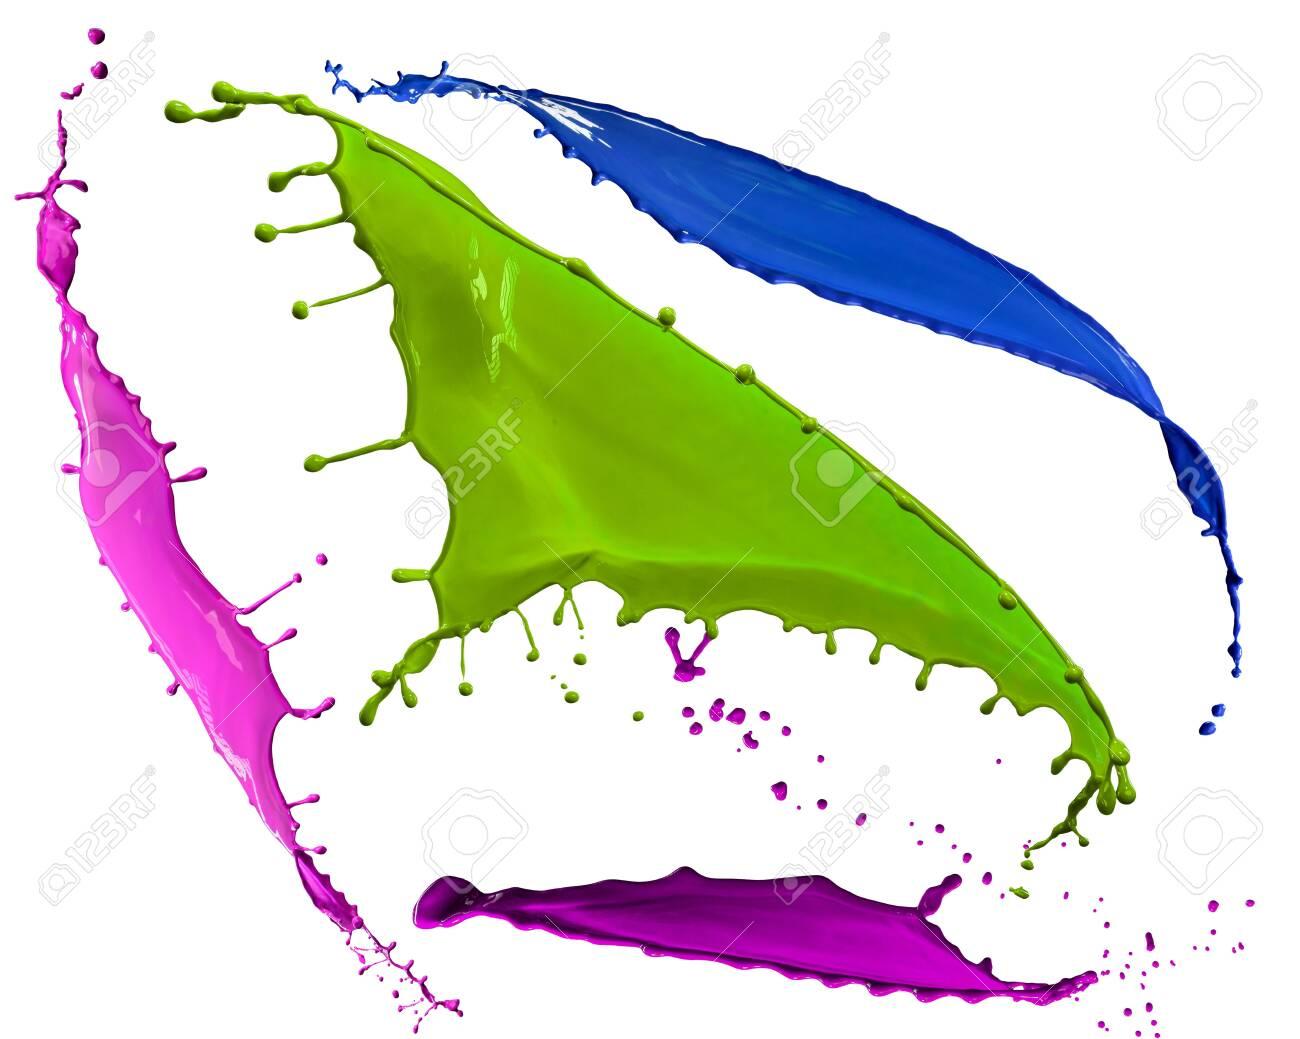 splendid different colors paint splash isolated on white background - 147542955